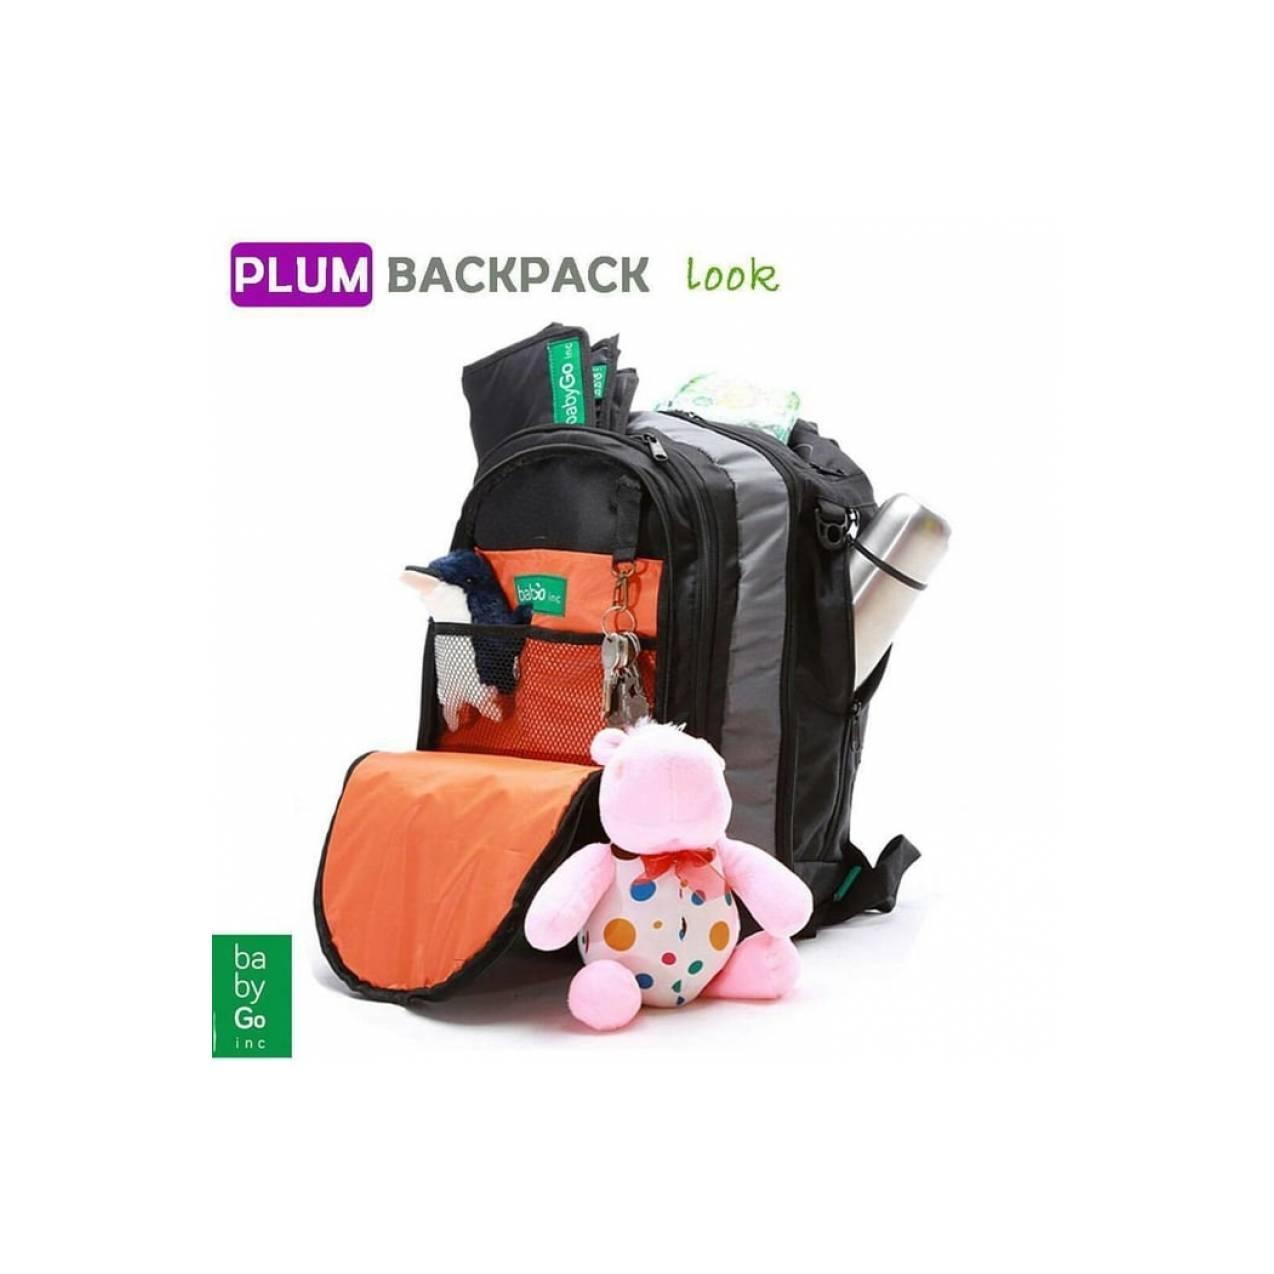 List Harga Baby Go Inc Urban 3 In 1 Diaper Backpack Babygo Metro Blue Plum Limited